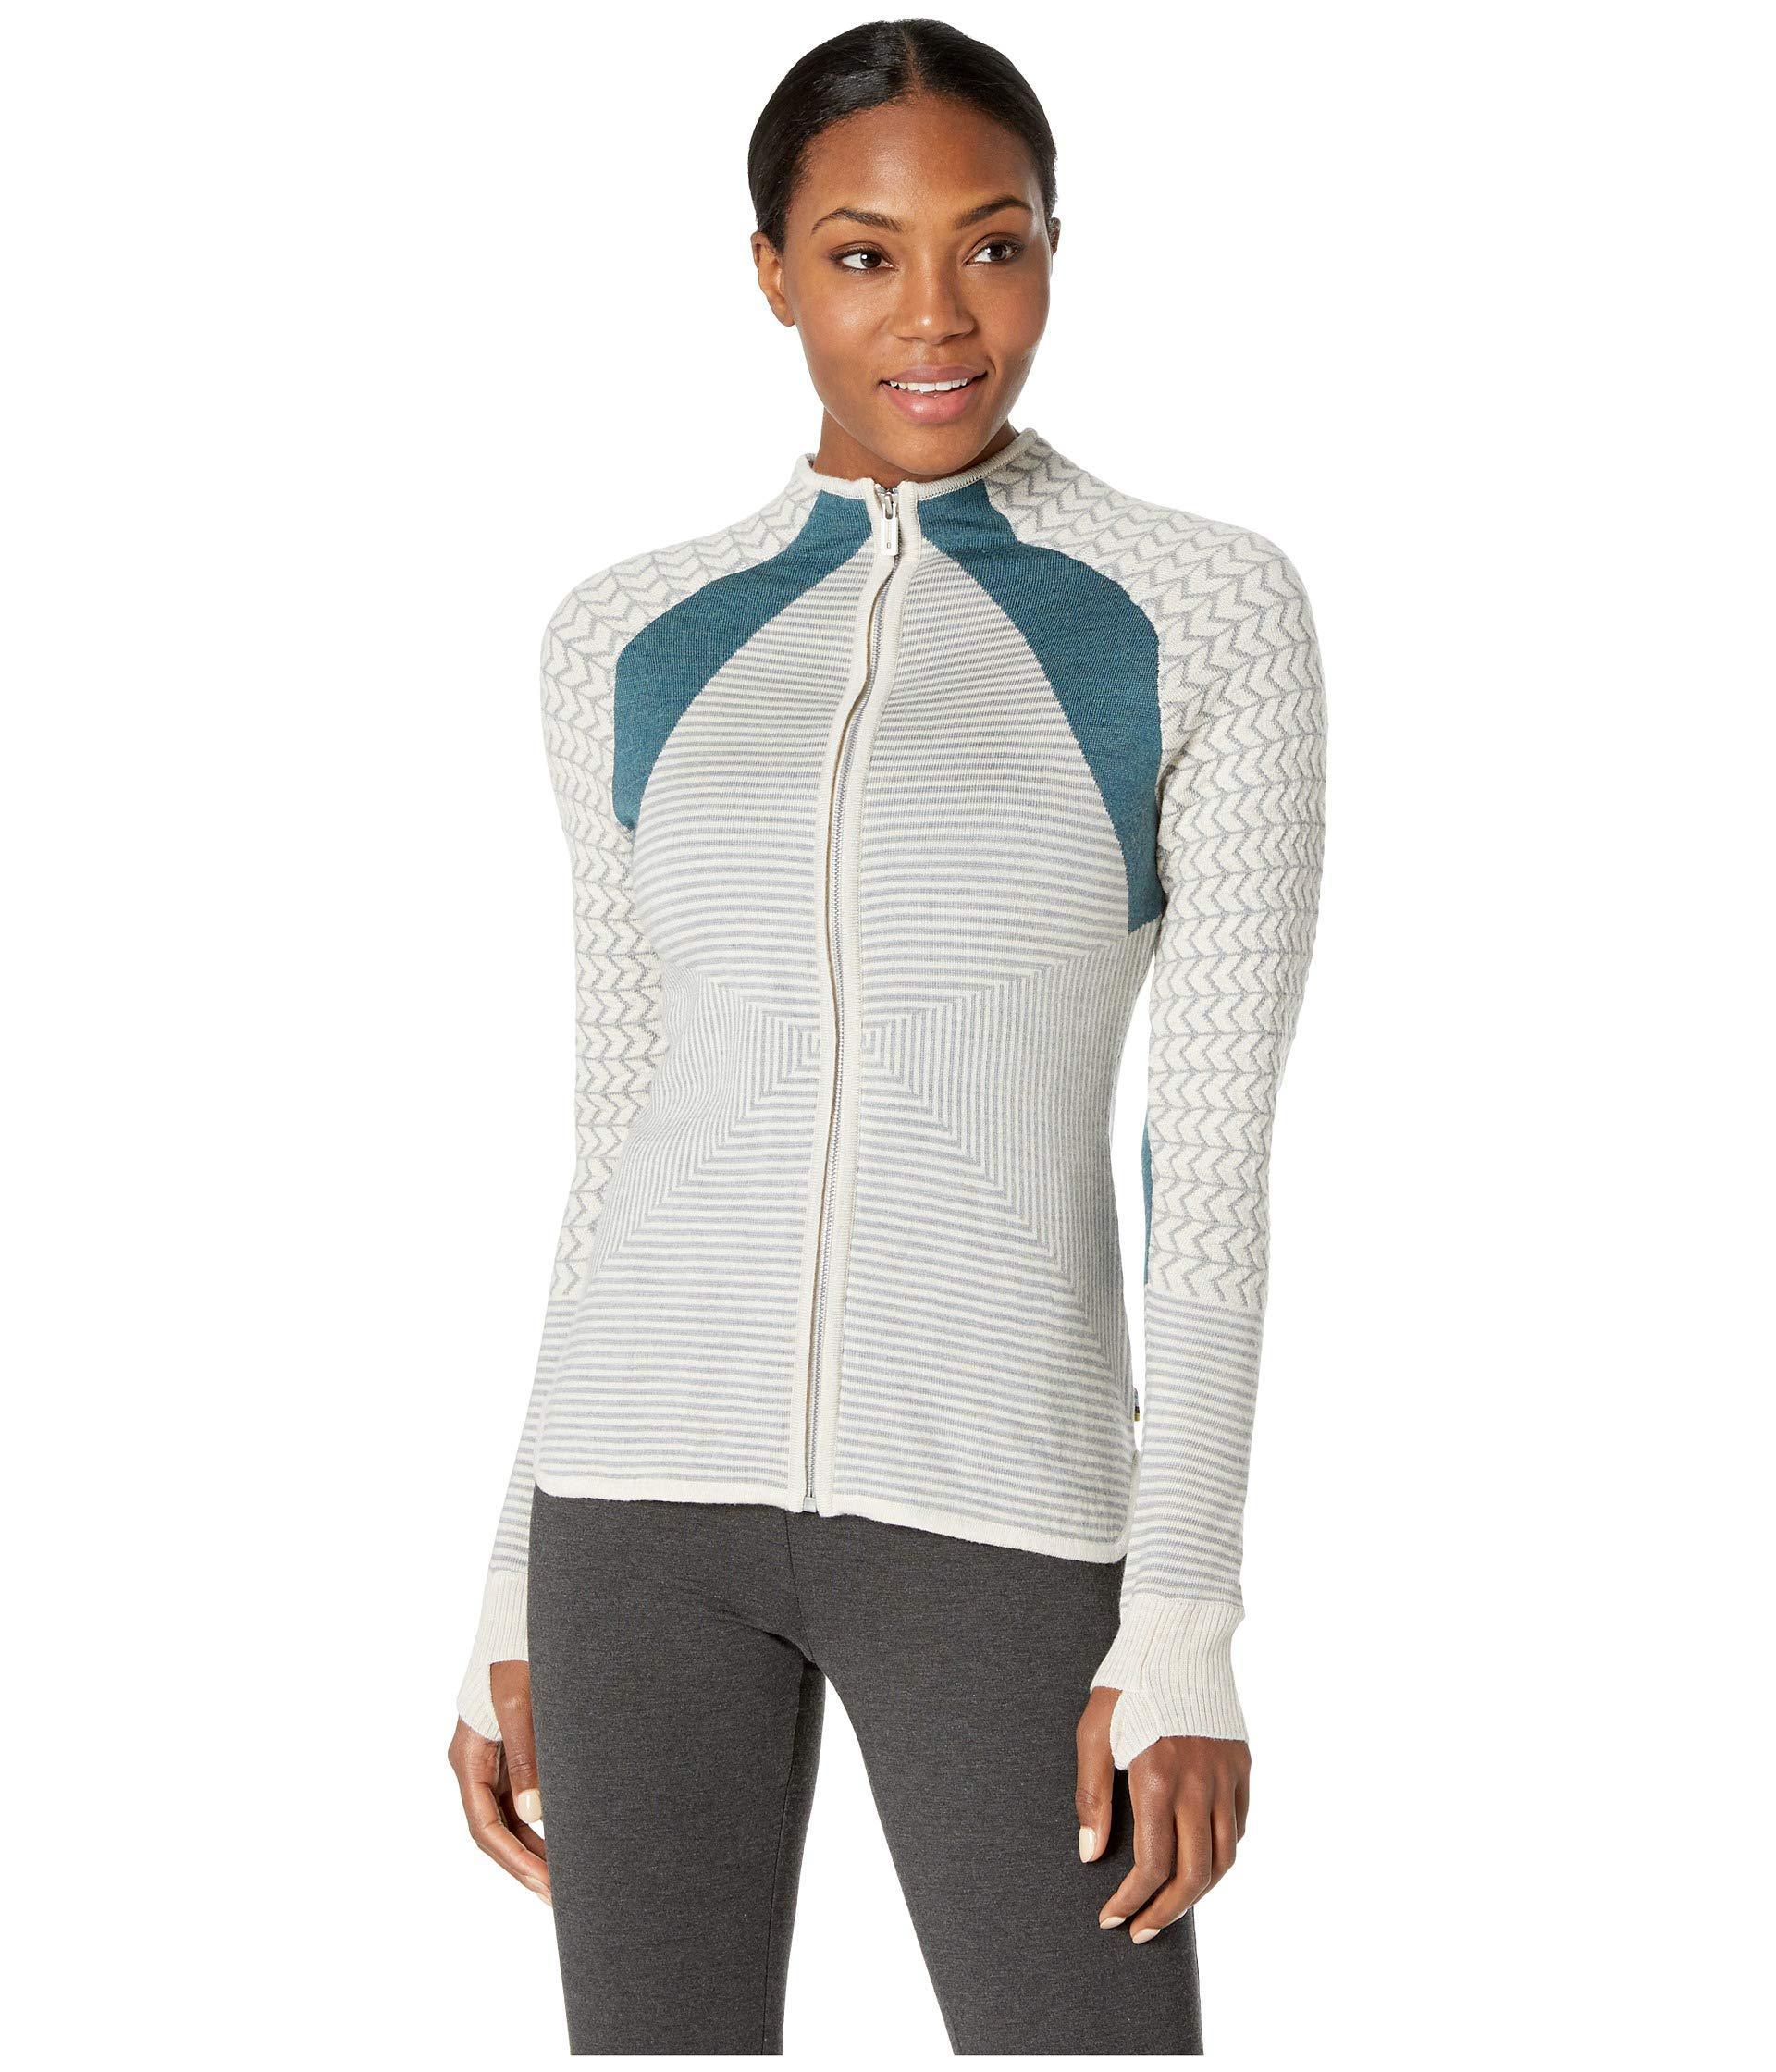 Smartwool Dacono Ski Sweater